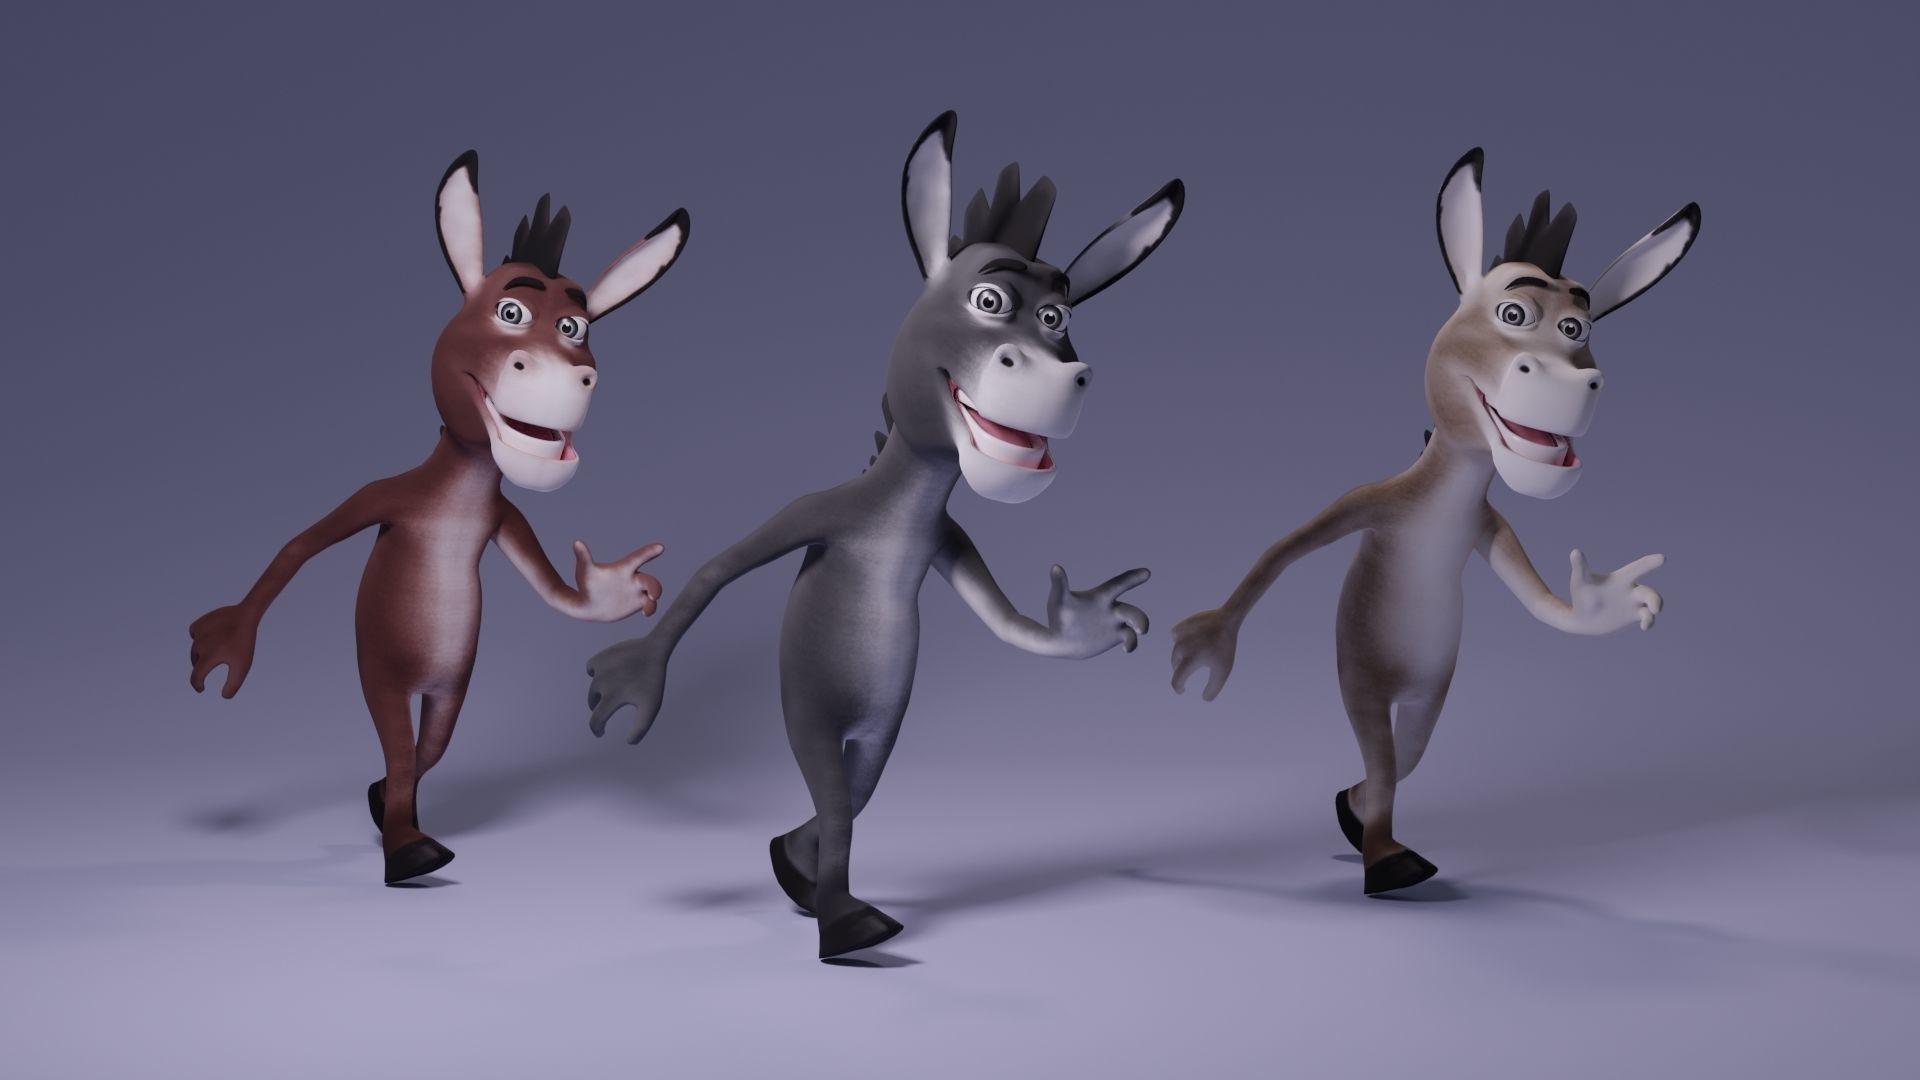 Toon Humanoid Donkey